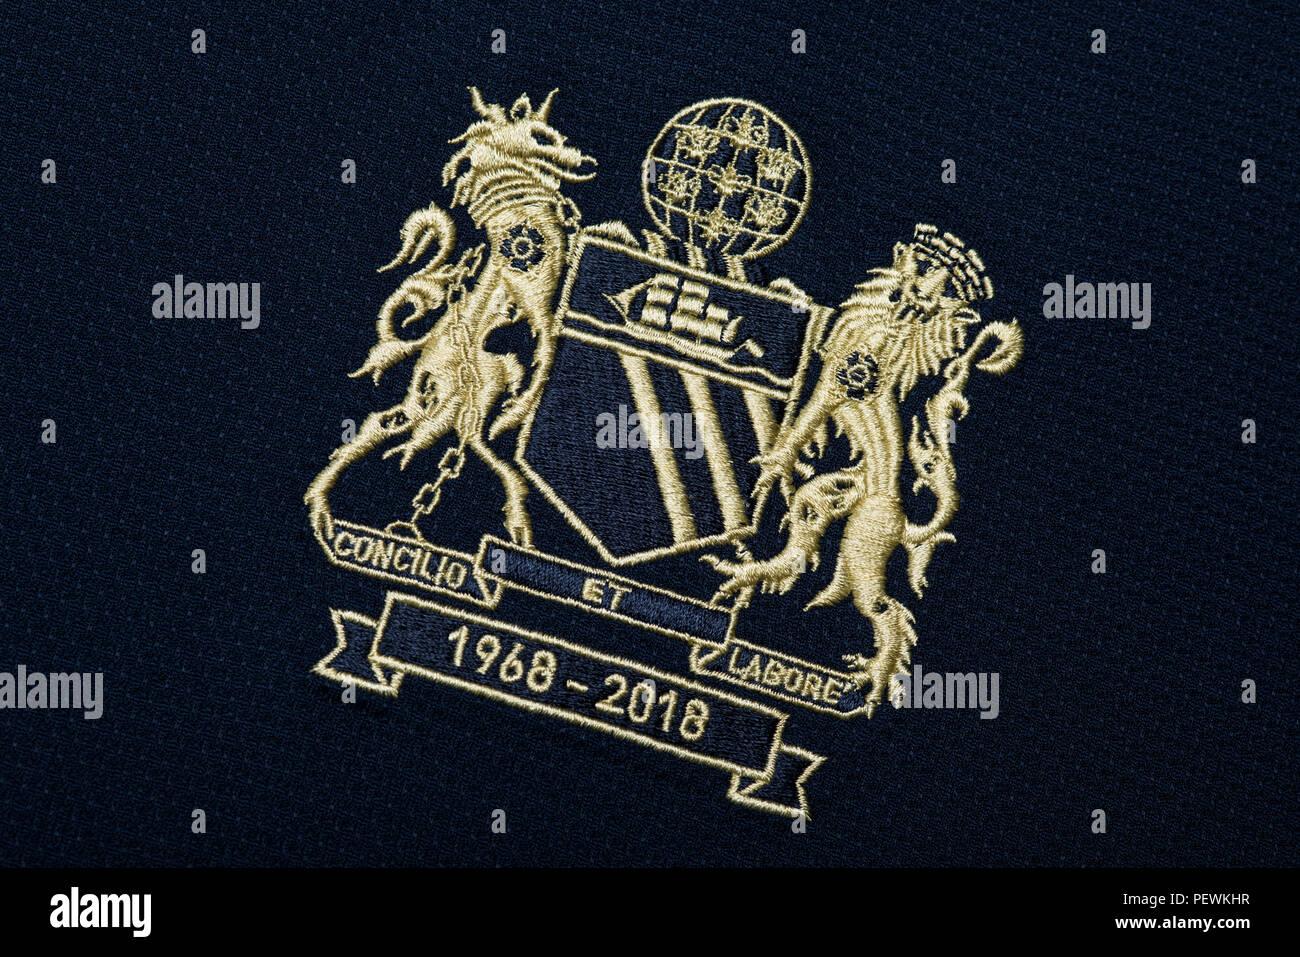 sale retailer 53b24 a67dc Manchester United 1968 European Cup Final Retro Away Shirt ...